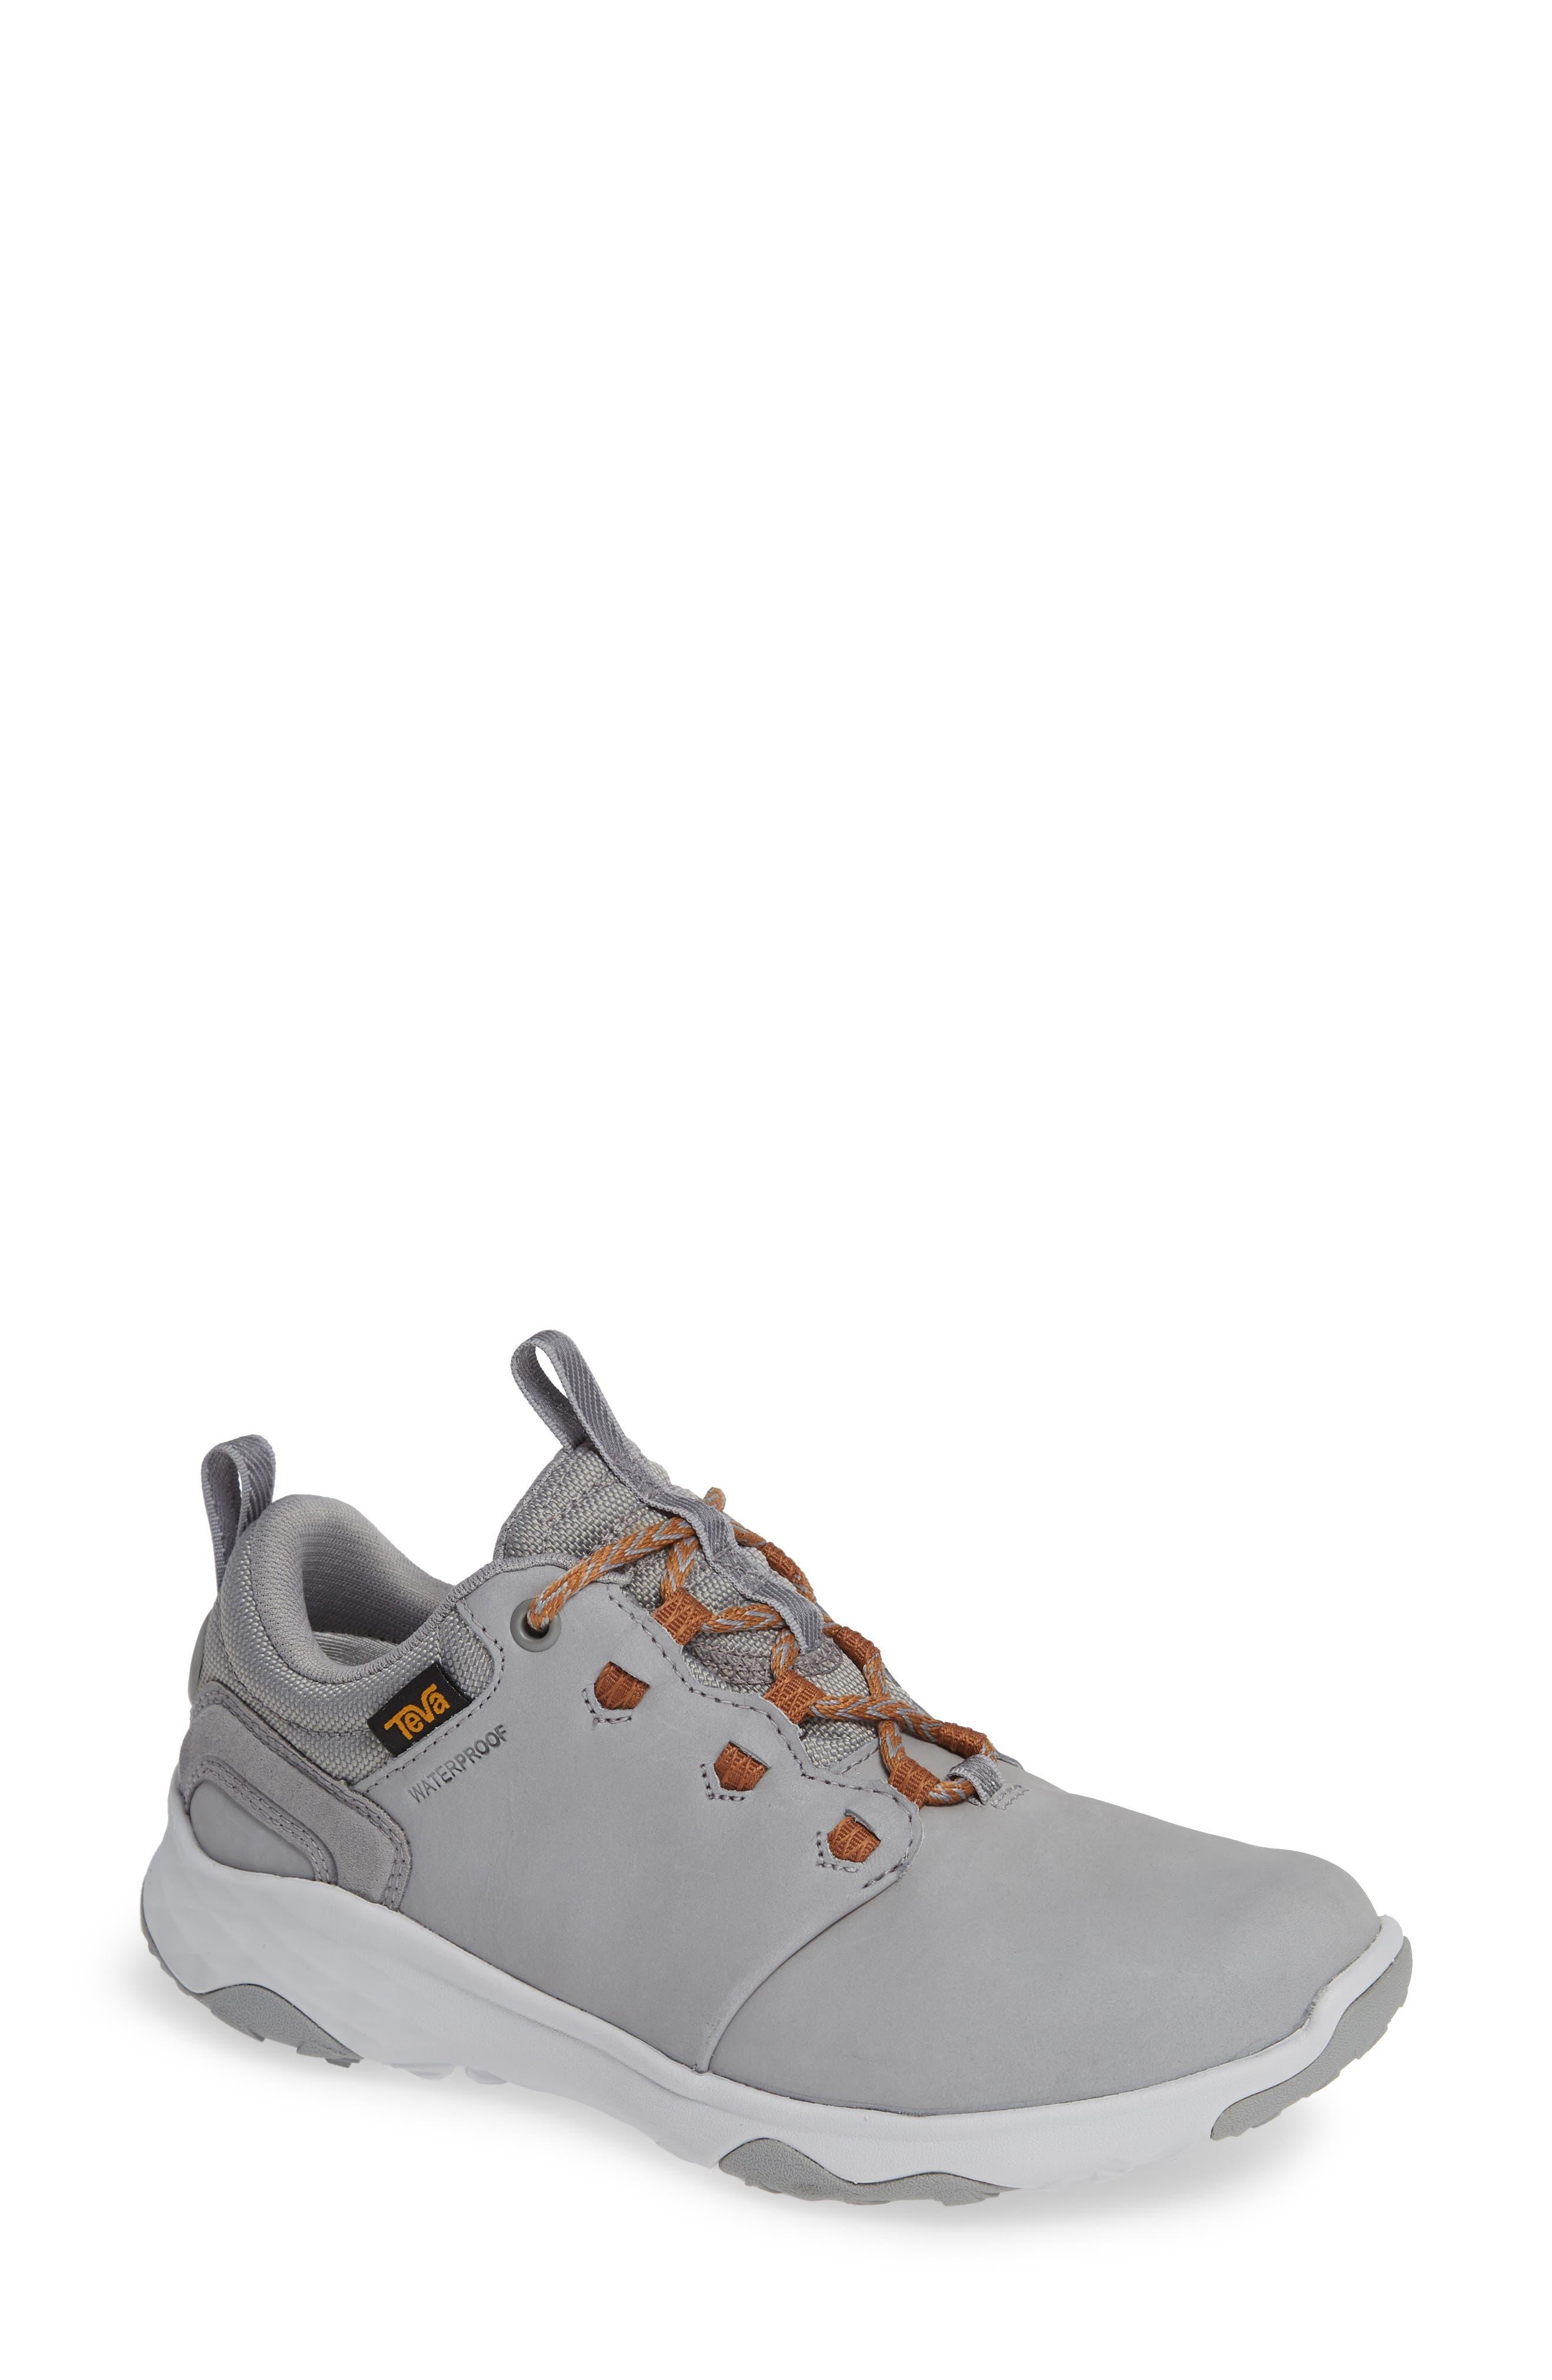 TEVA 'Arrowood' Waterproof Sneaker, Main, color, WILD DOVE LEATHER